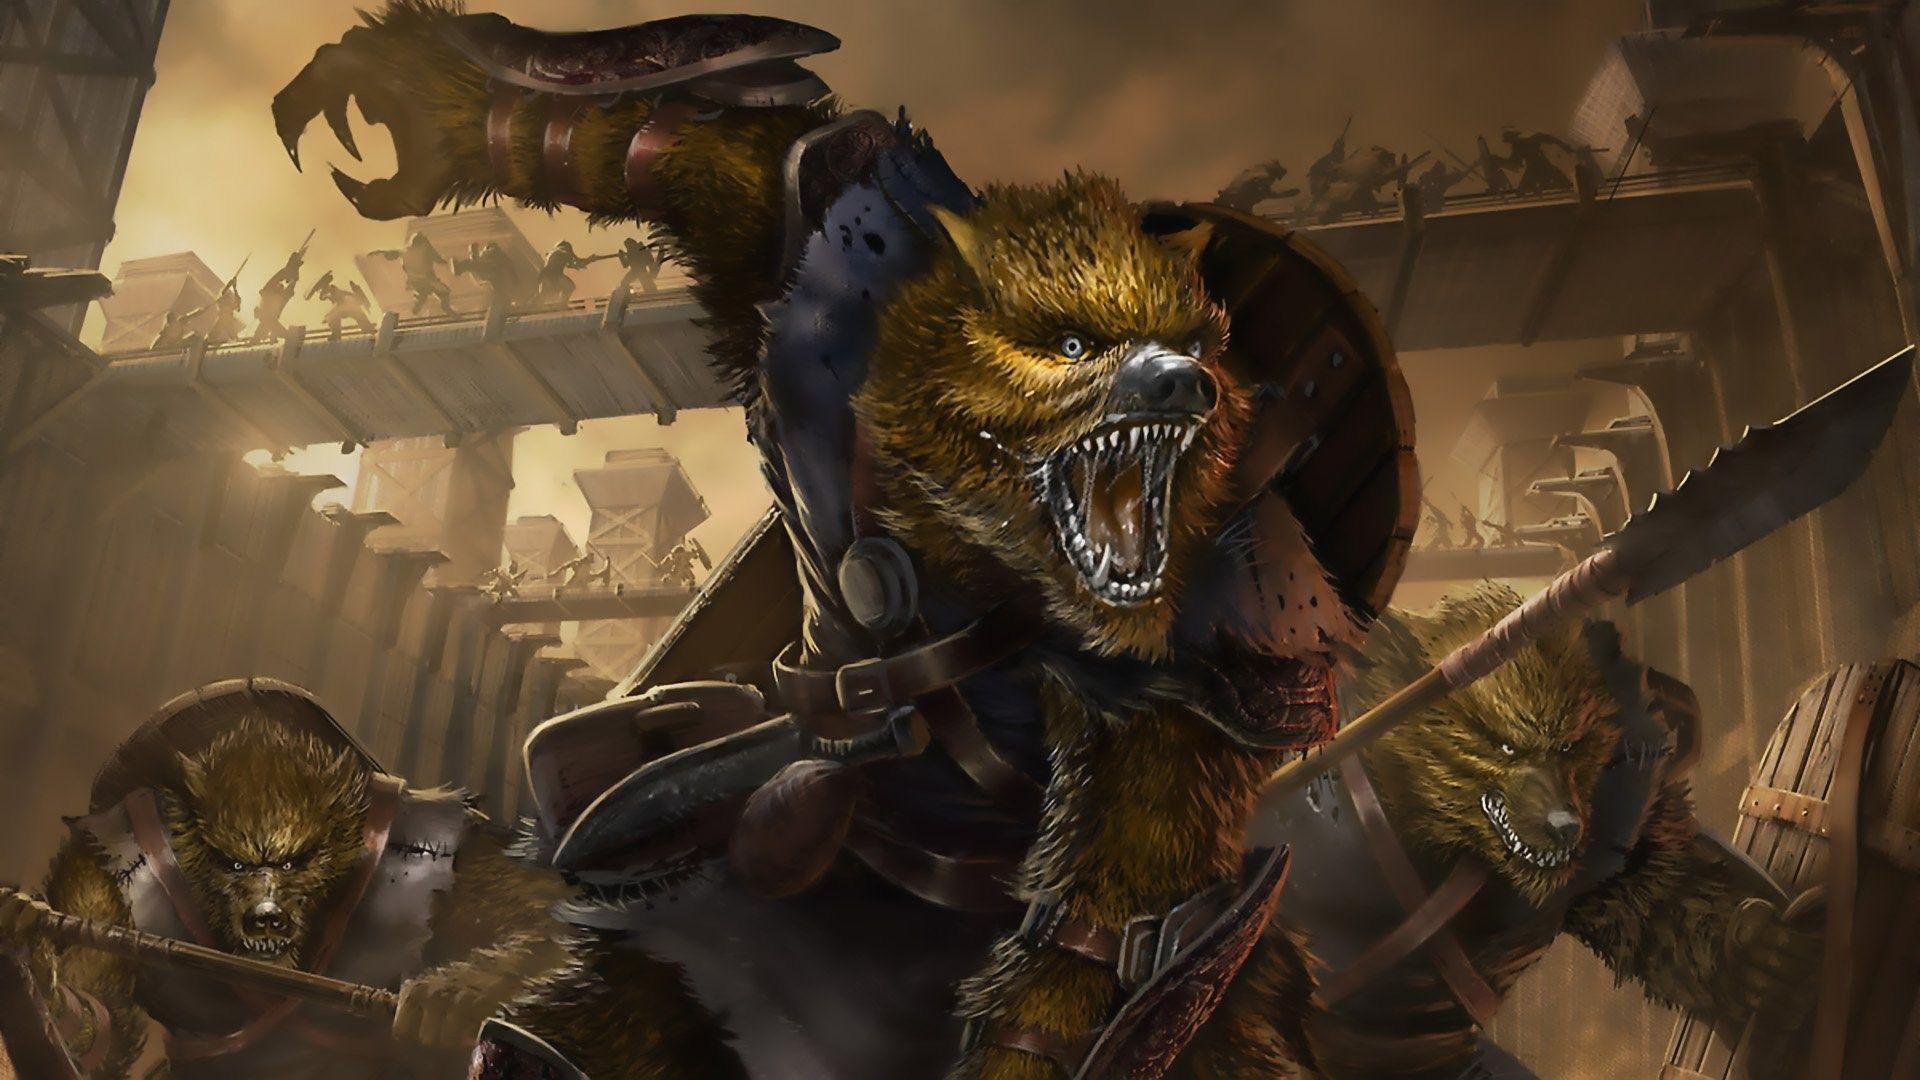 free werewolf wallpaper o oshka Pinterest